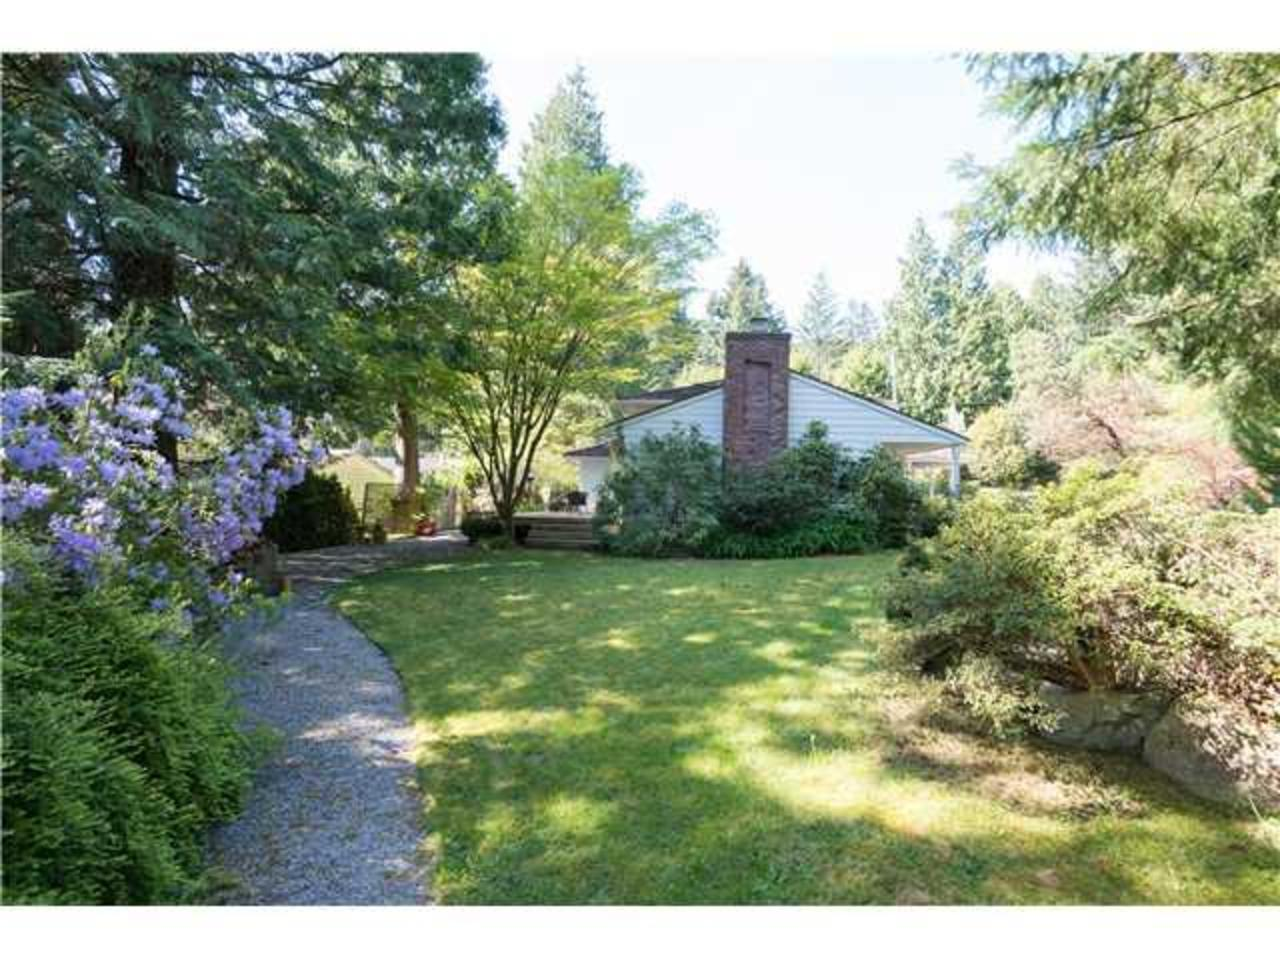 Backyard at 5654 Westport Road, Eagle Harbour, West Vancouver